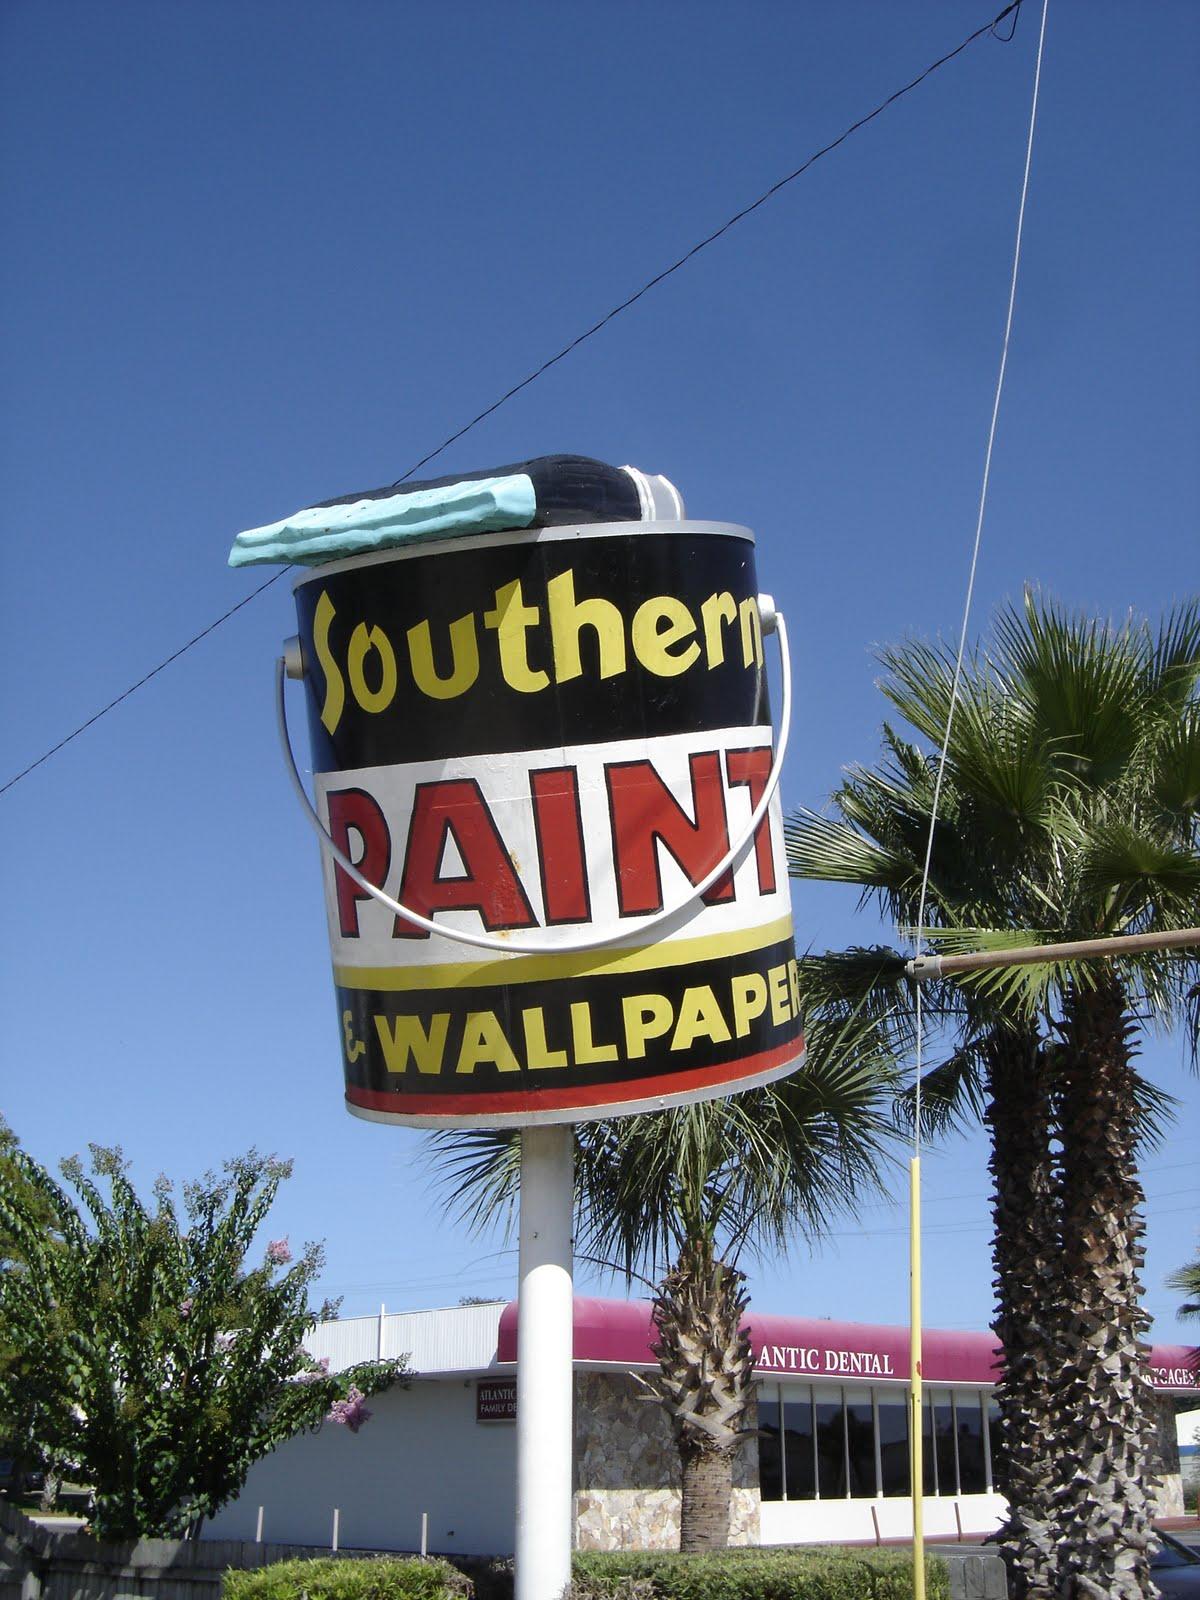 http://2.bp.blogspot.com/-1TOfQvi-qkg/TjXwCD_bo4I/AAAAAAAARdo/AkrRl6ScAA8/s1600/605+South+Dixie+Freeway.JPG